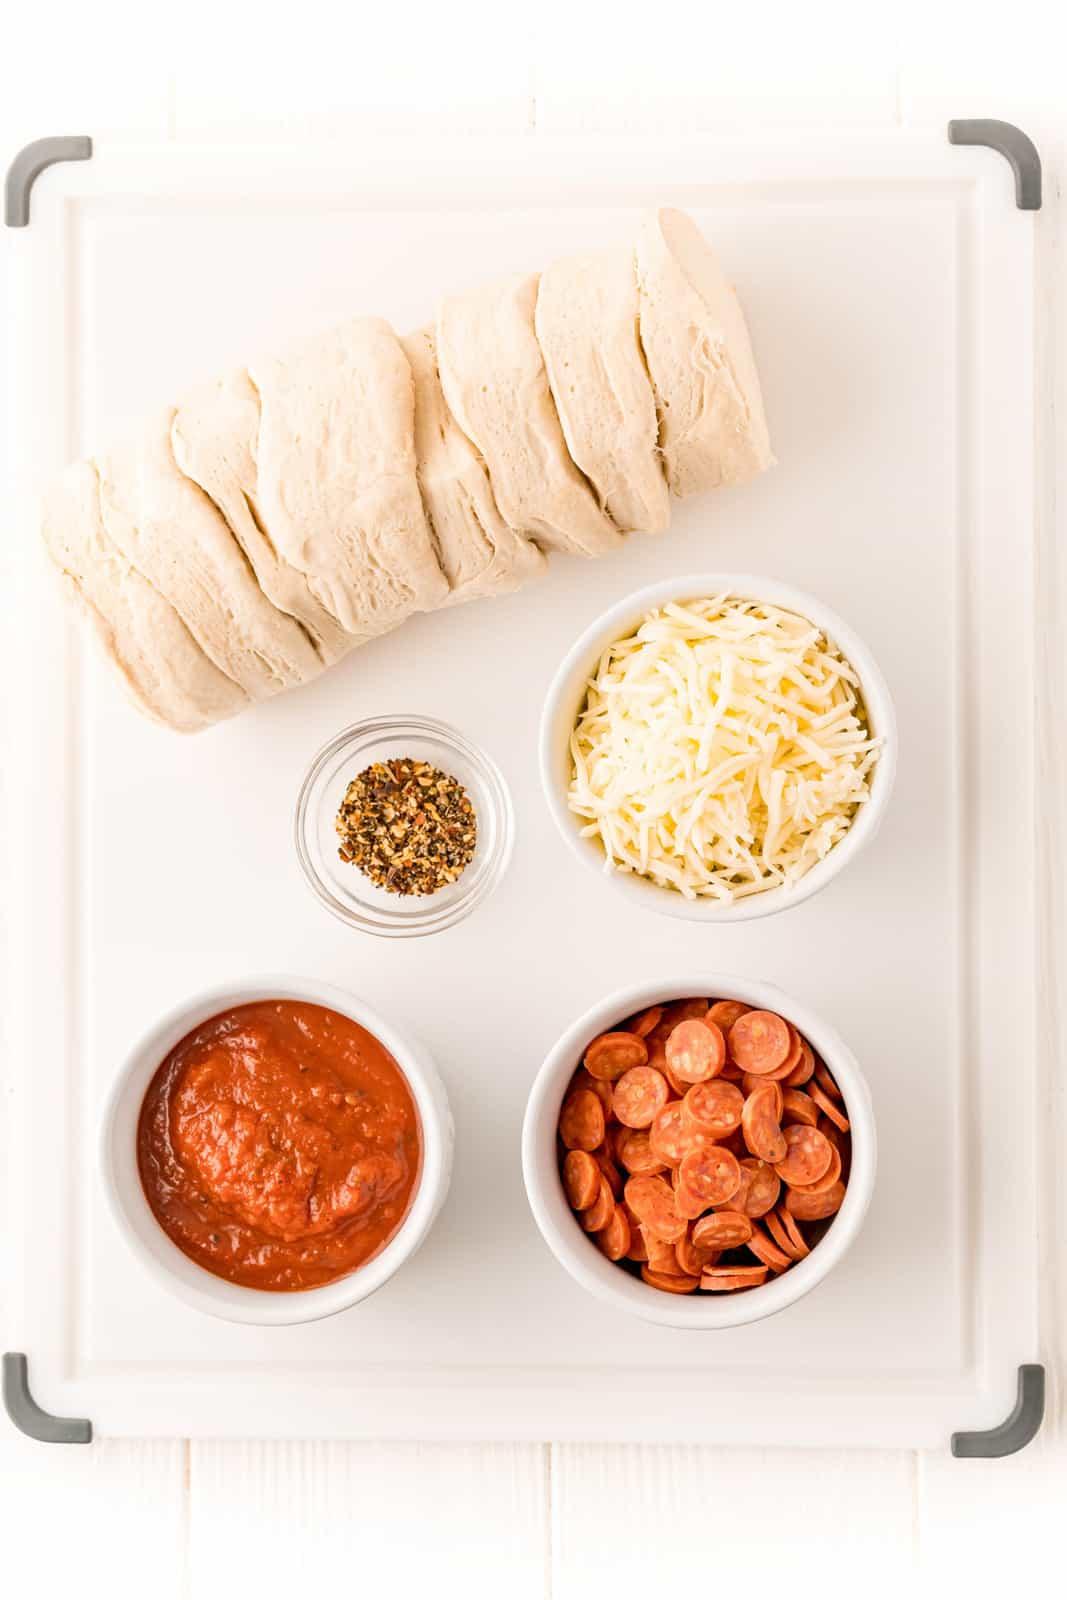 Ingredients needed to make Air Fryer Pizza